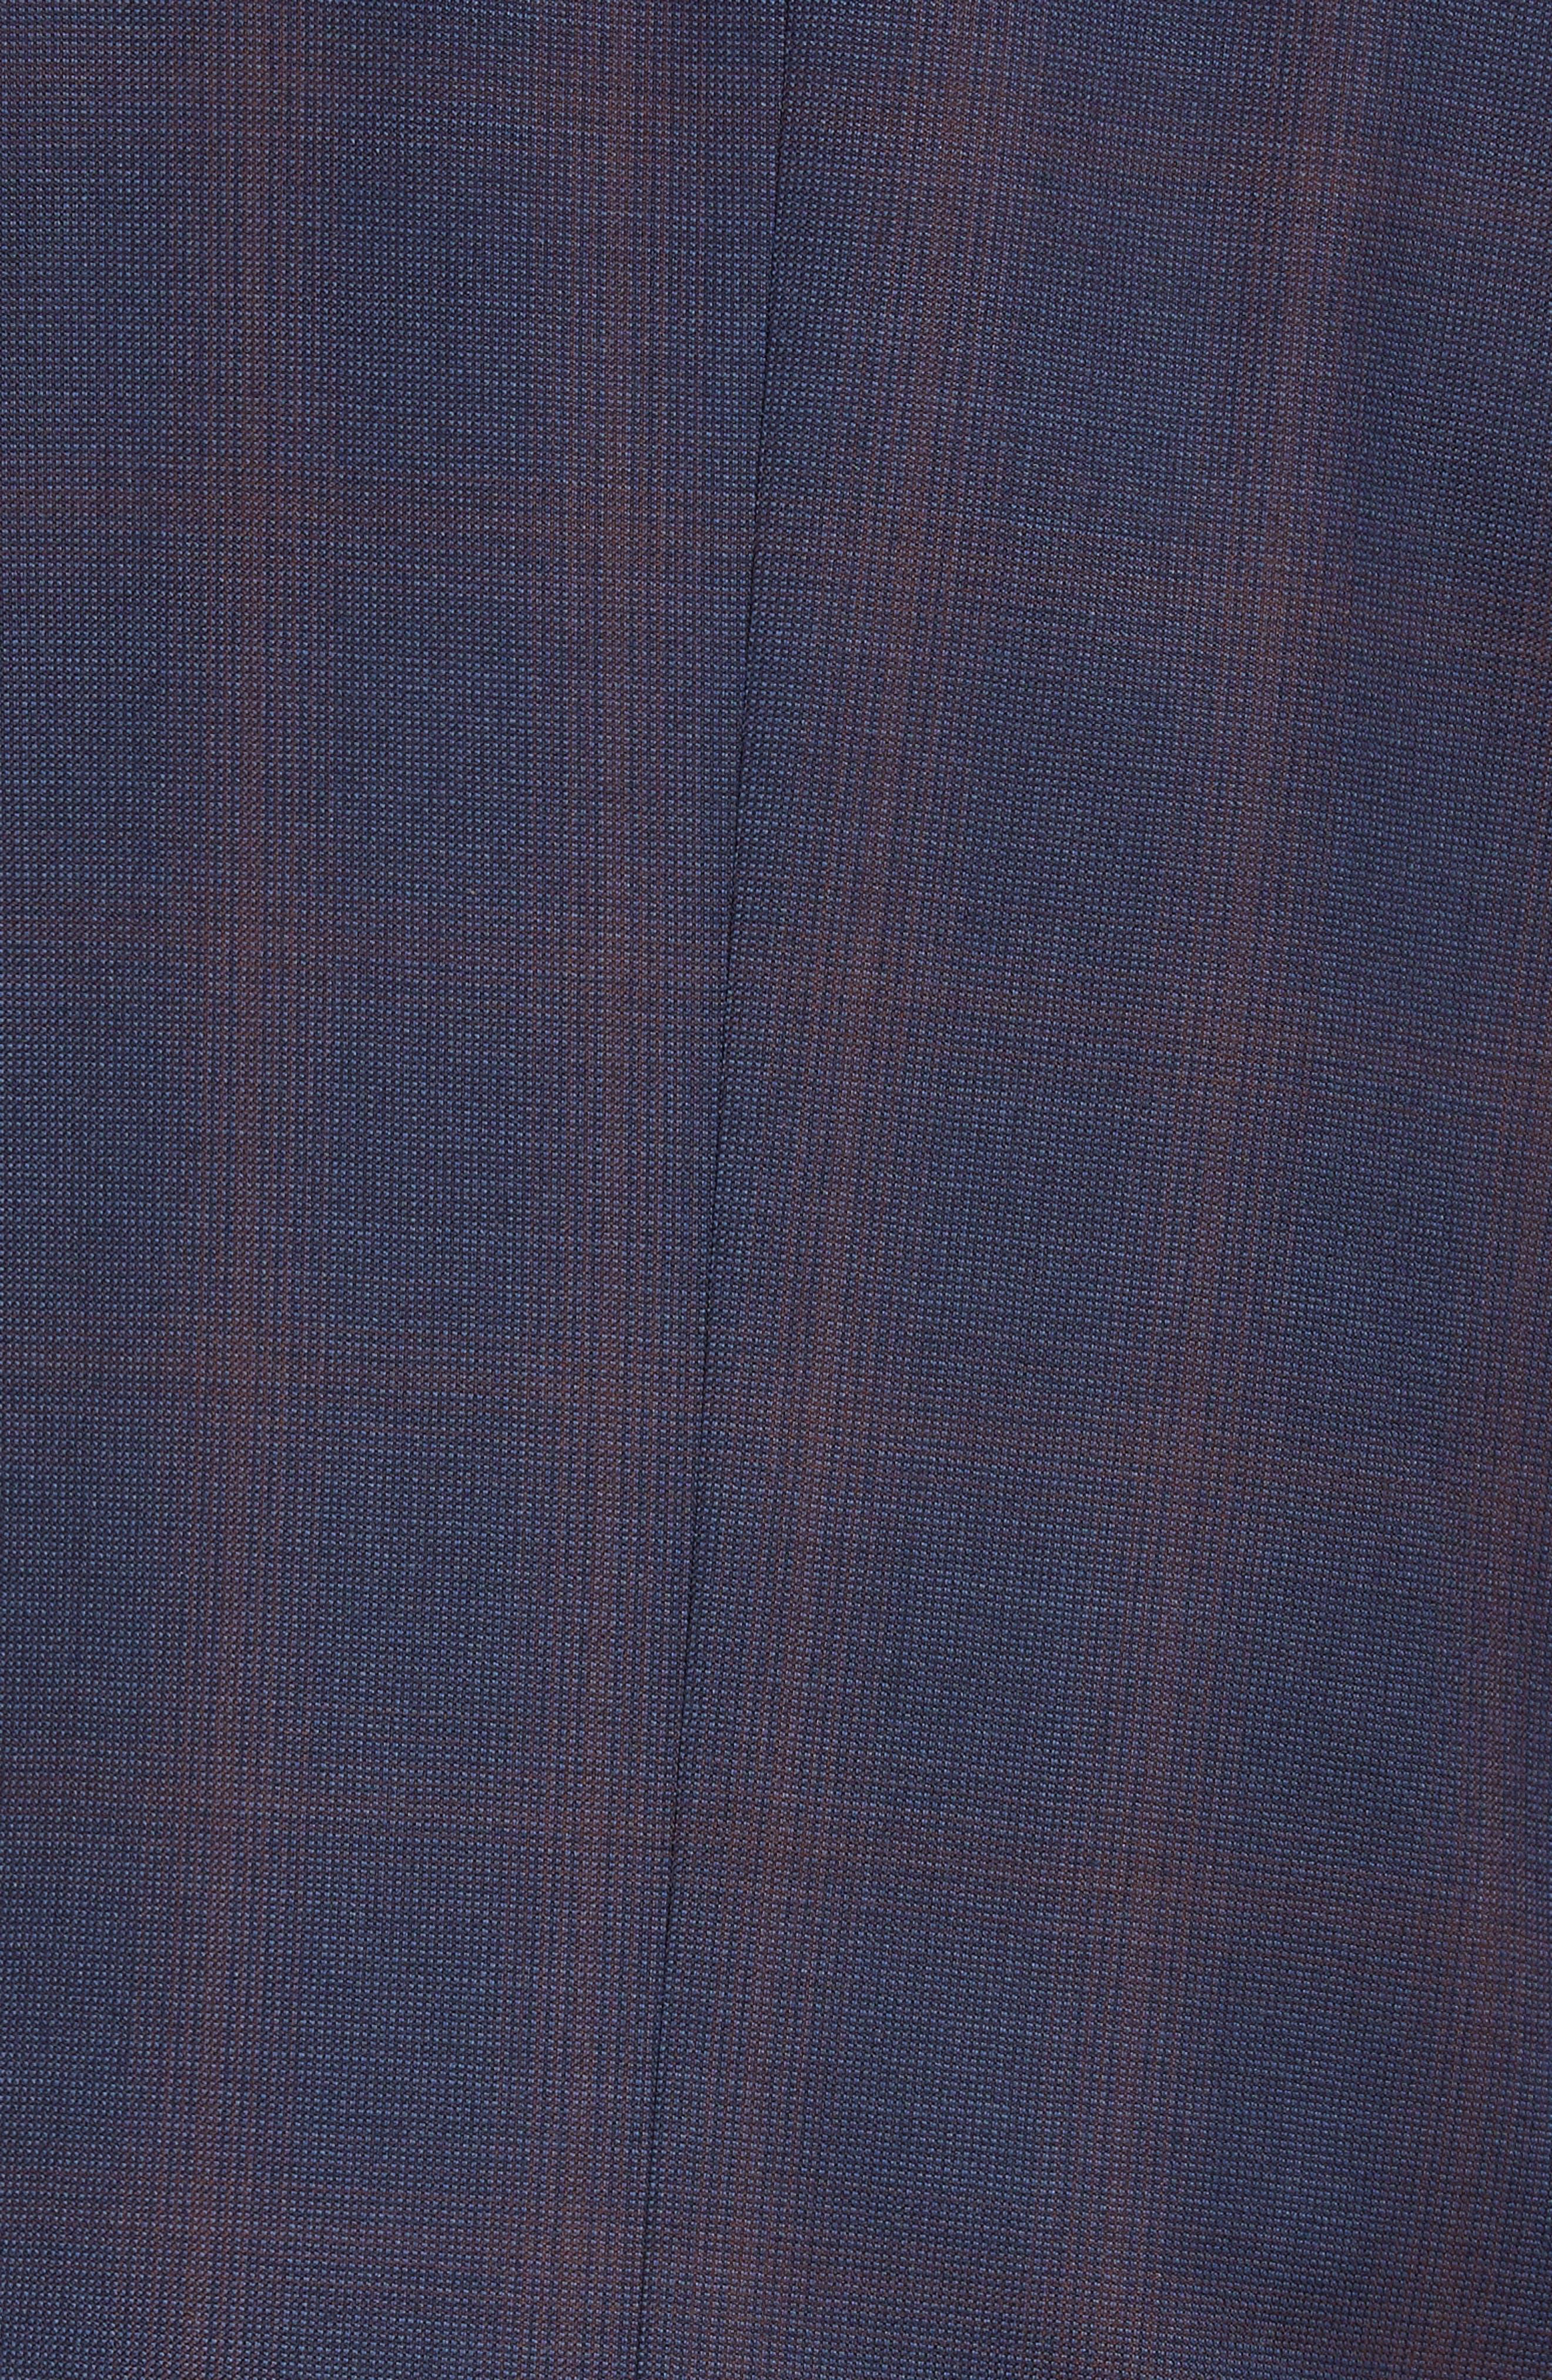 TED BAKER LONDON,                             Roger Slim Fit Plaid Wool Suit,                             Alternate thumbnail 7, color,                             NAVY